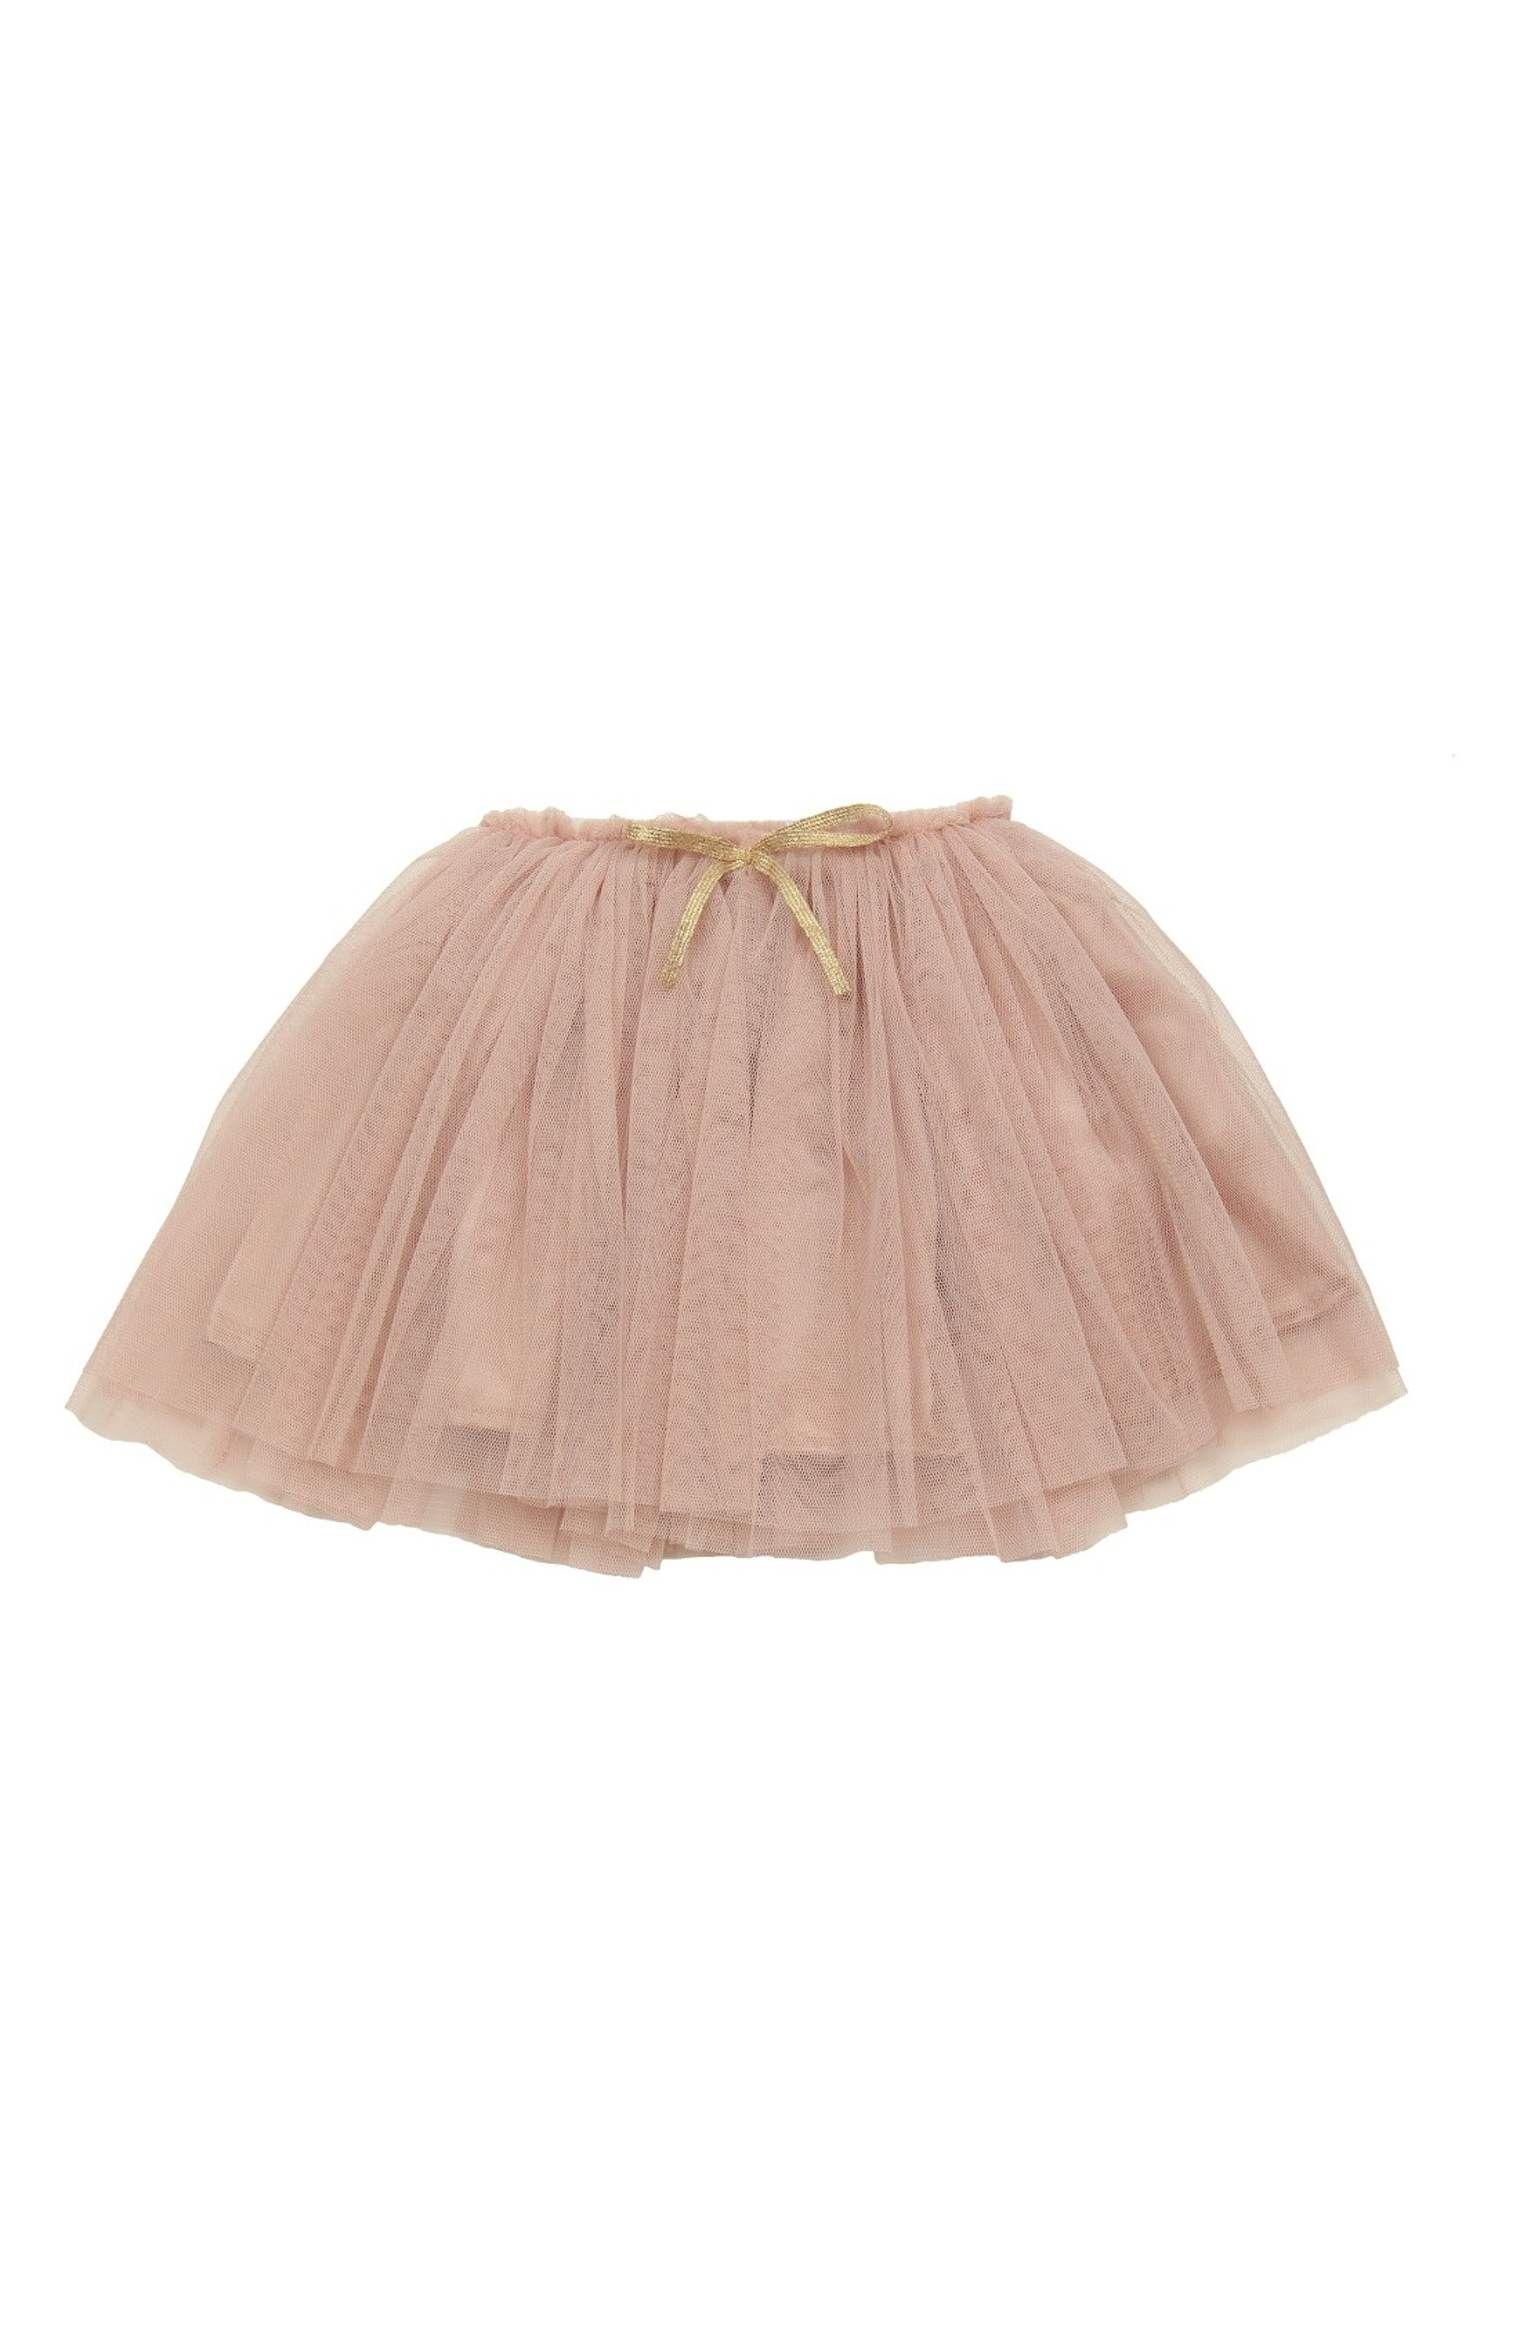 a00f929f1 Main Image - Popatu Tutu Skirt (Baby Girls)